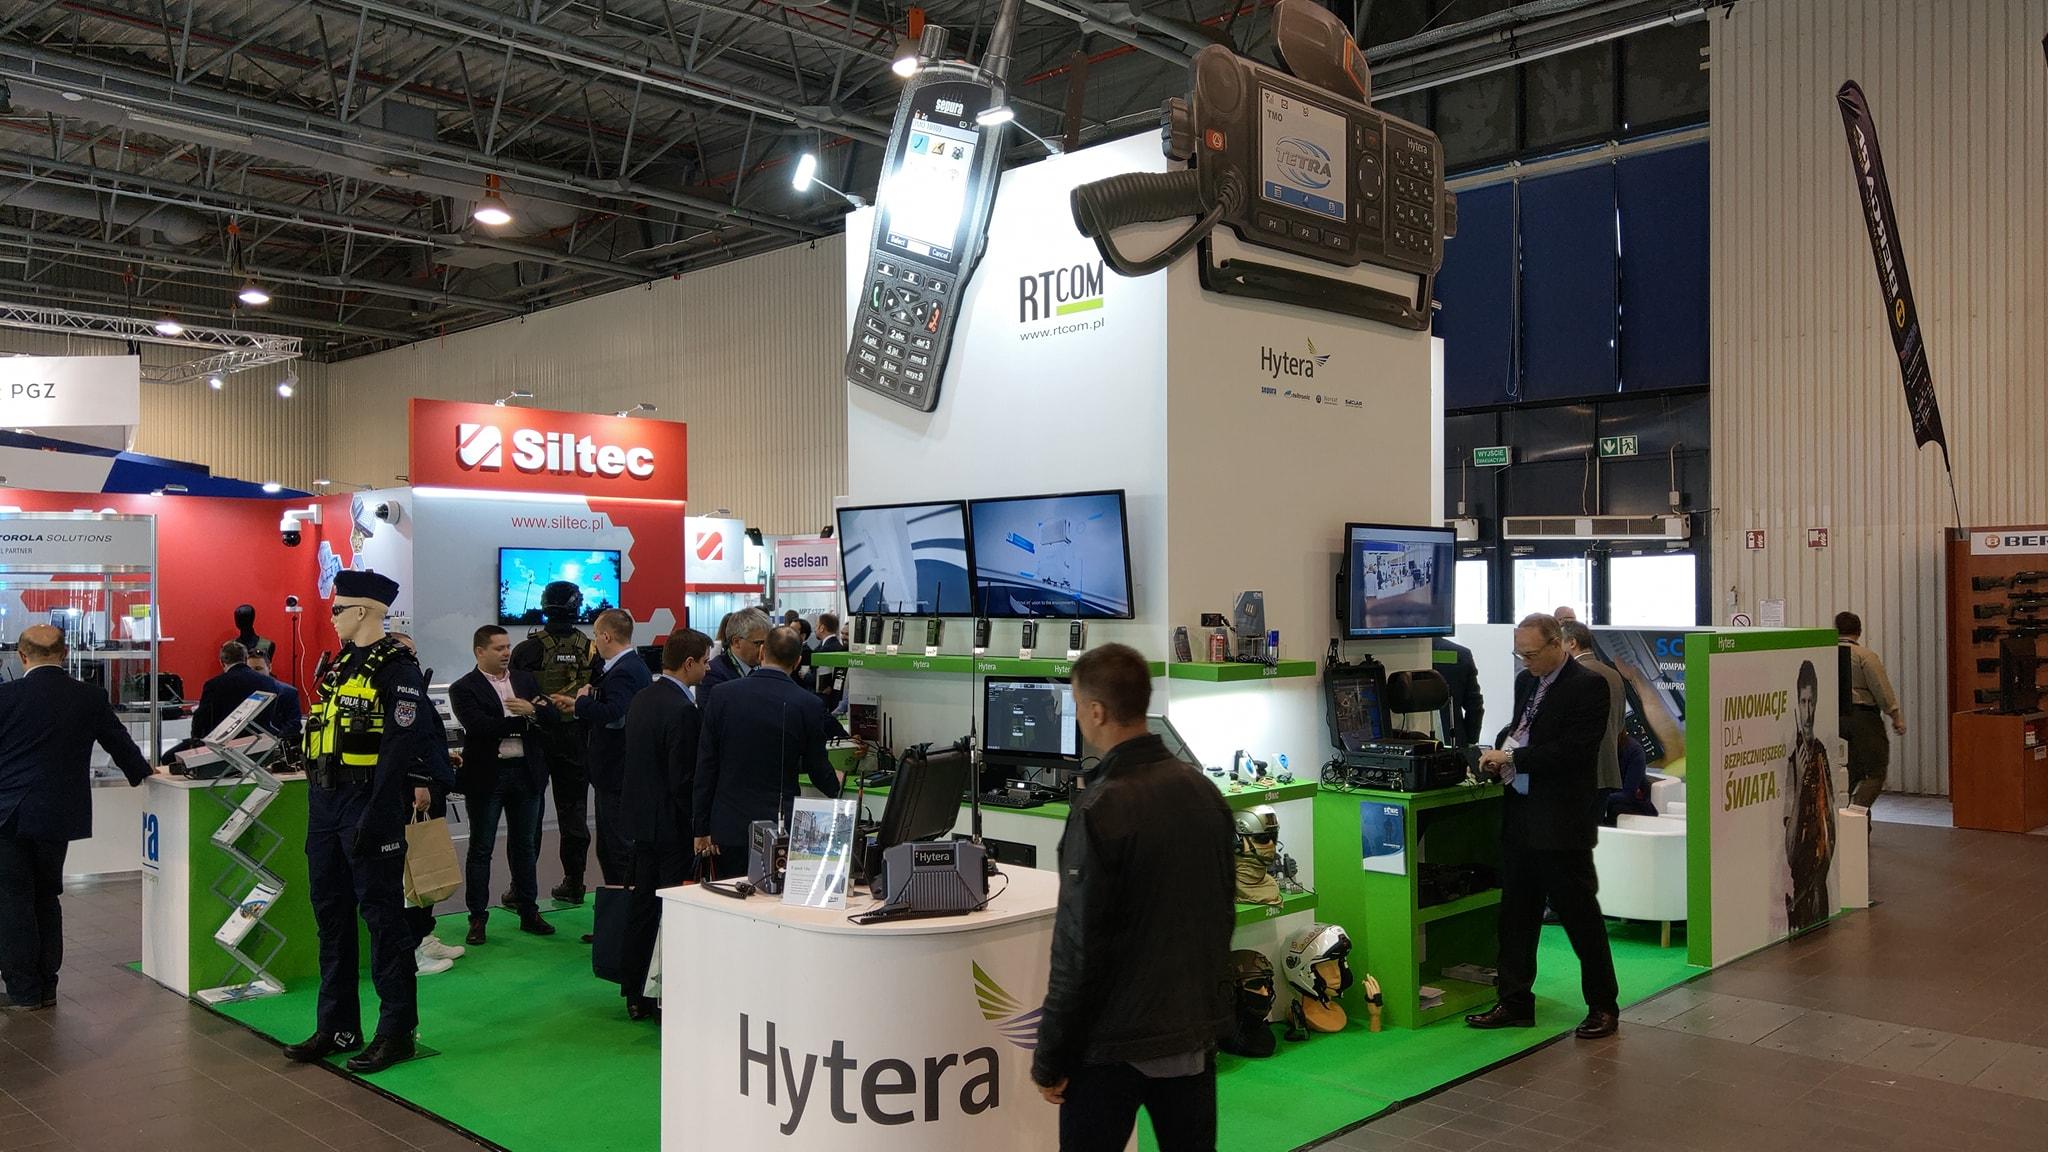 04-Stoisko-RTcom-Hytera-Europoltech-2019-Warszawa.jpg